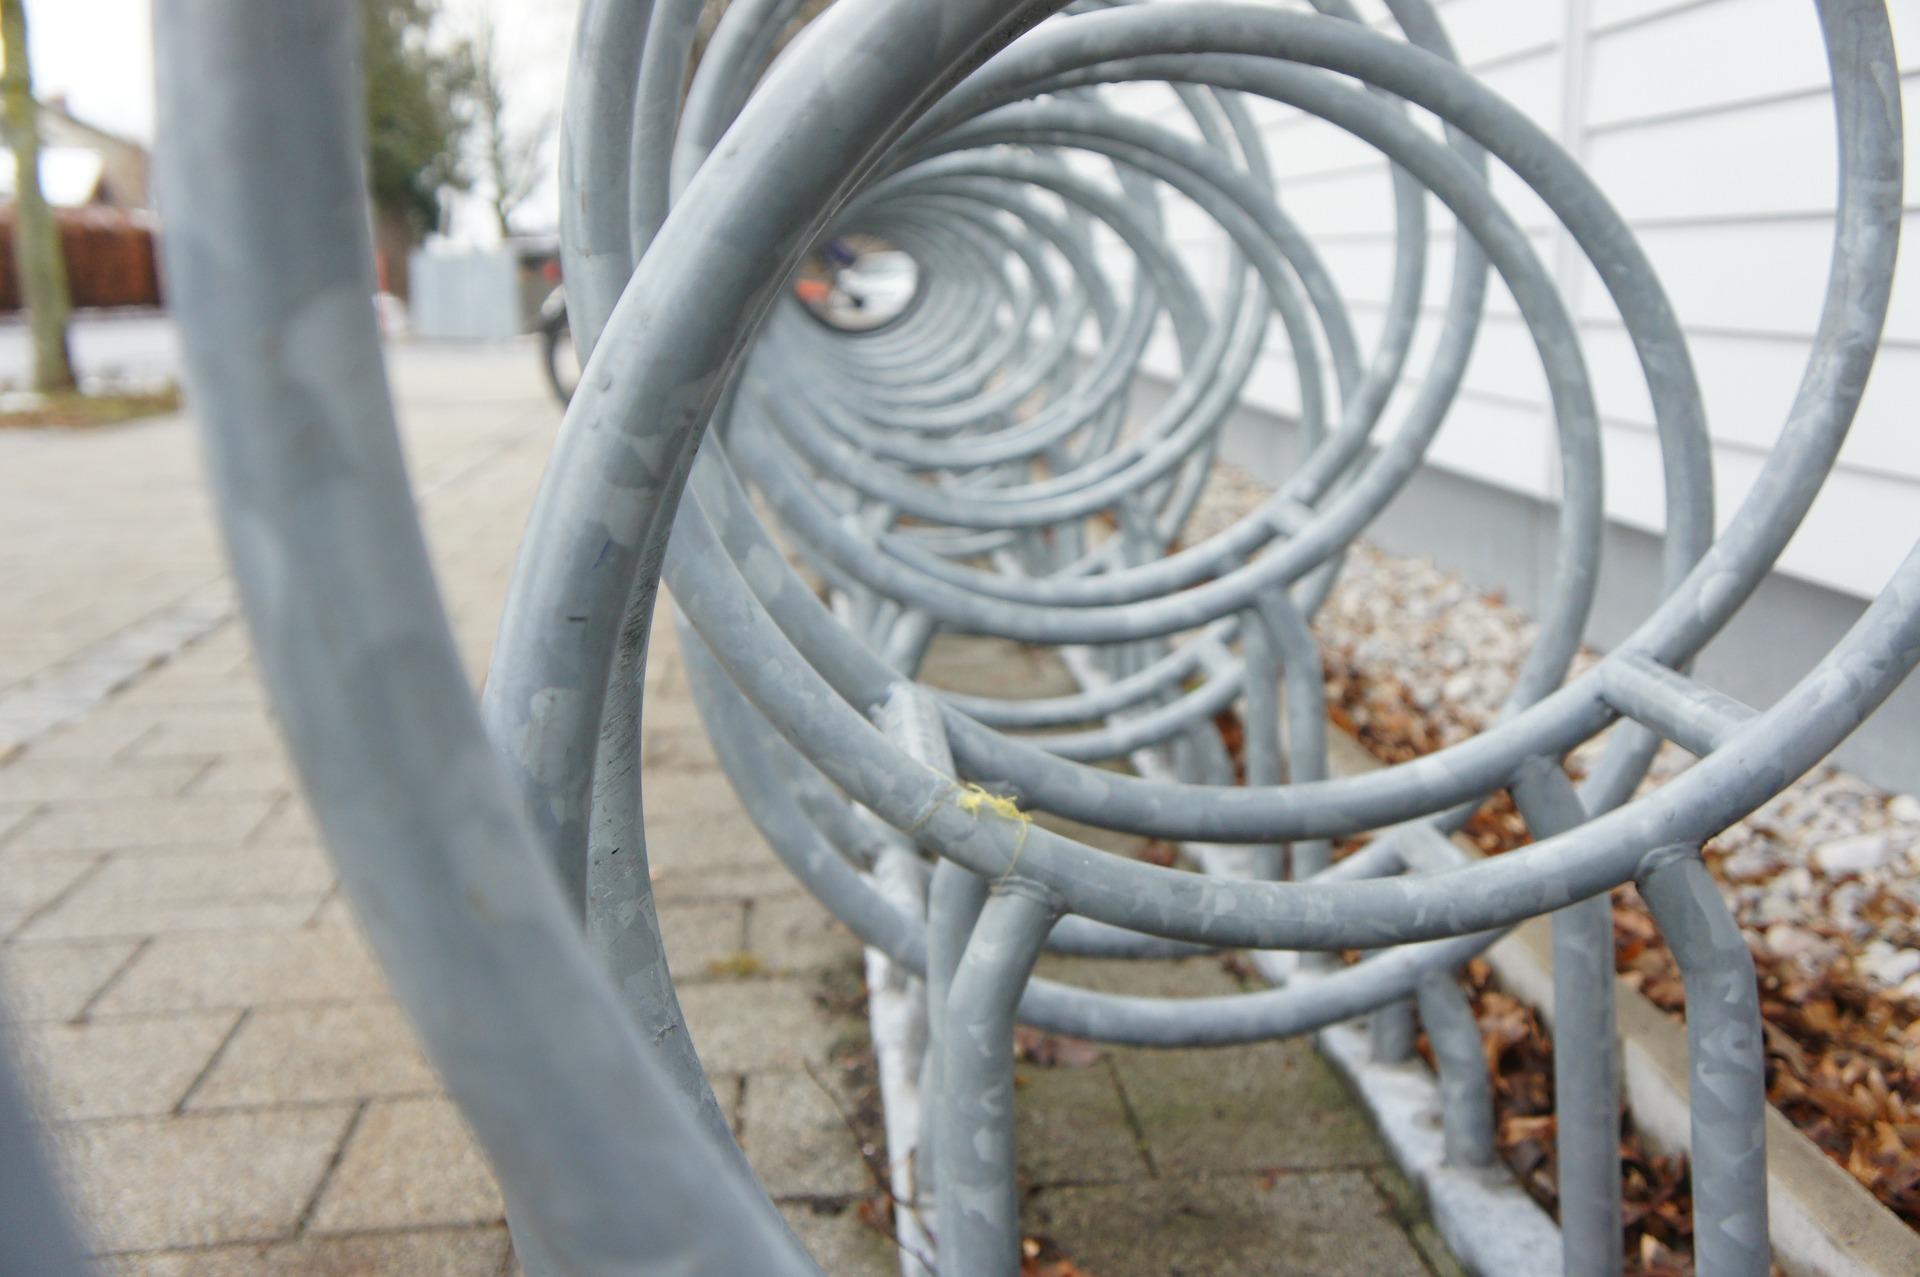 Fahrradspirale